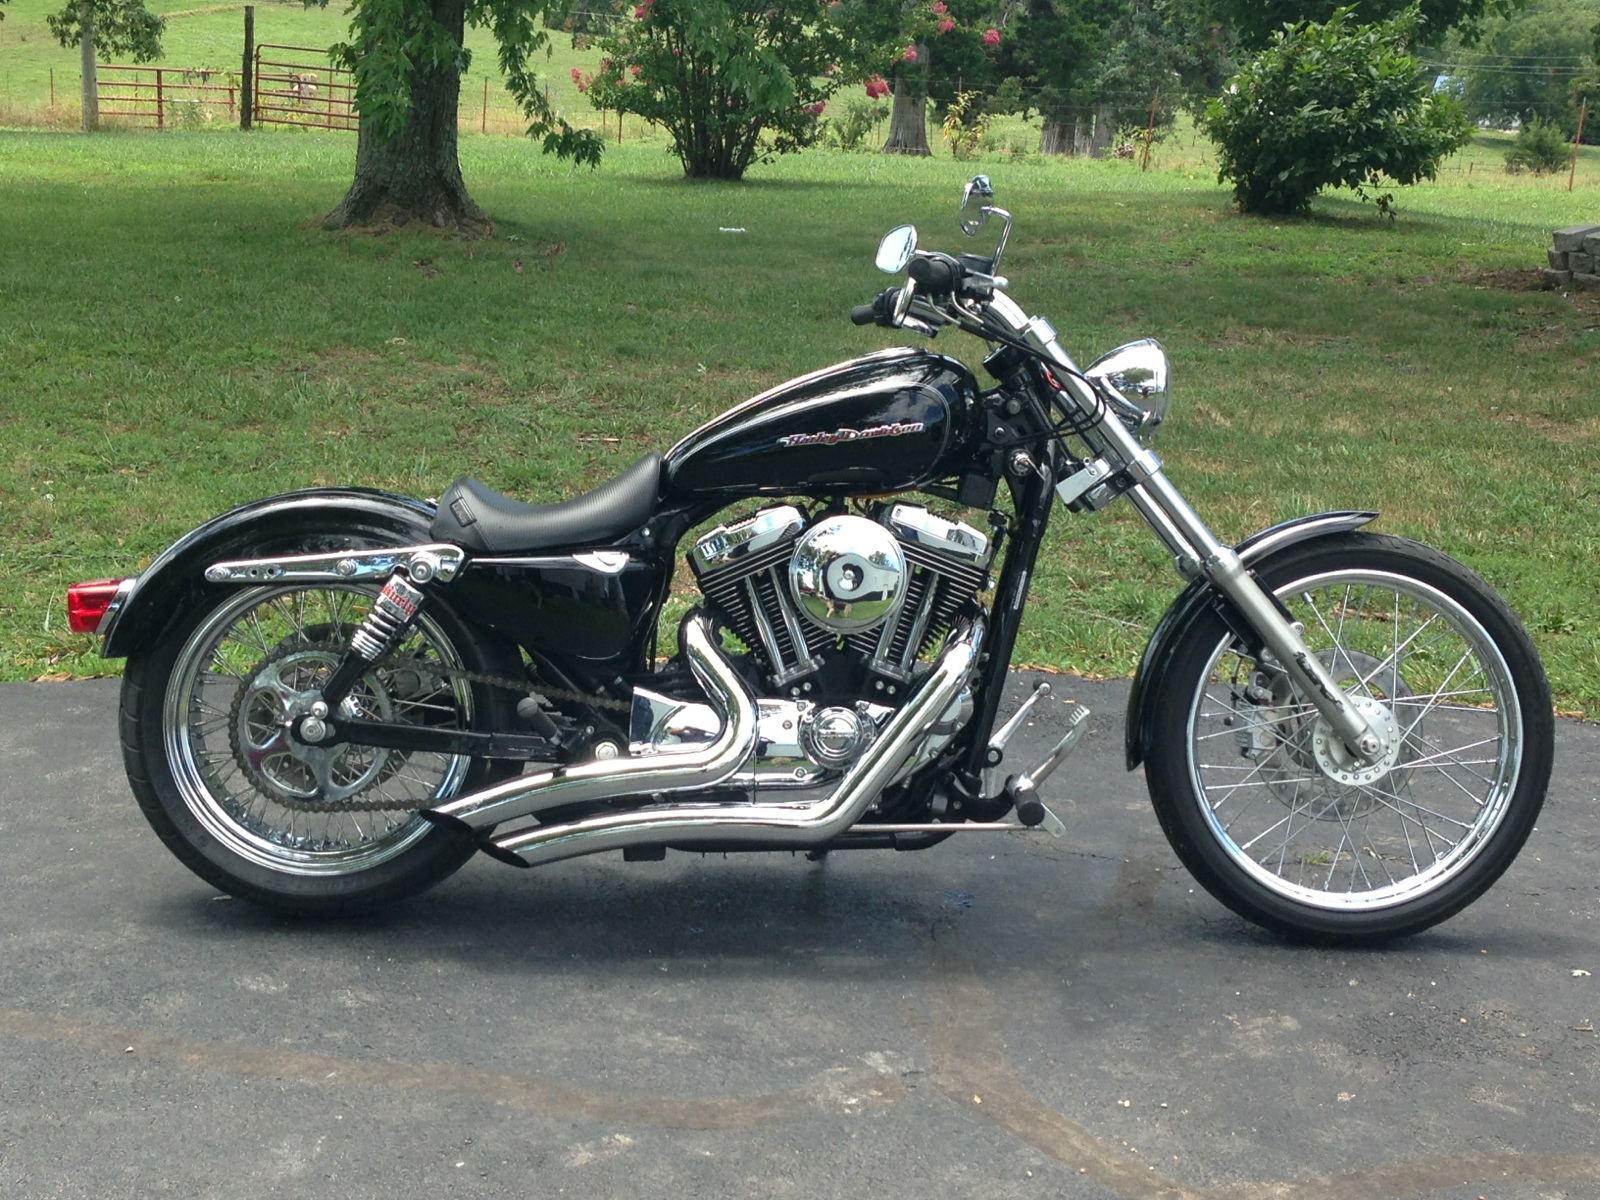 Chopper Kits For Harley-Davidson® Sportster Models